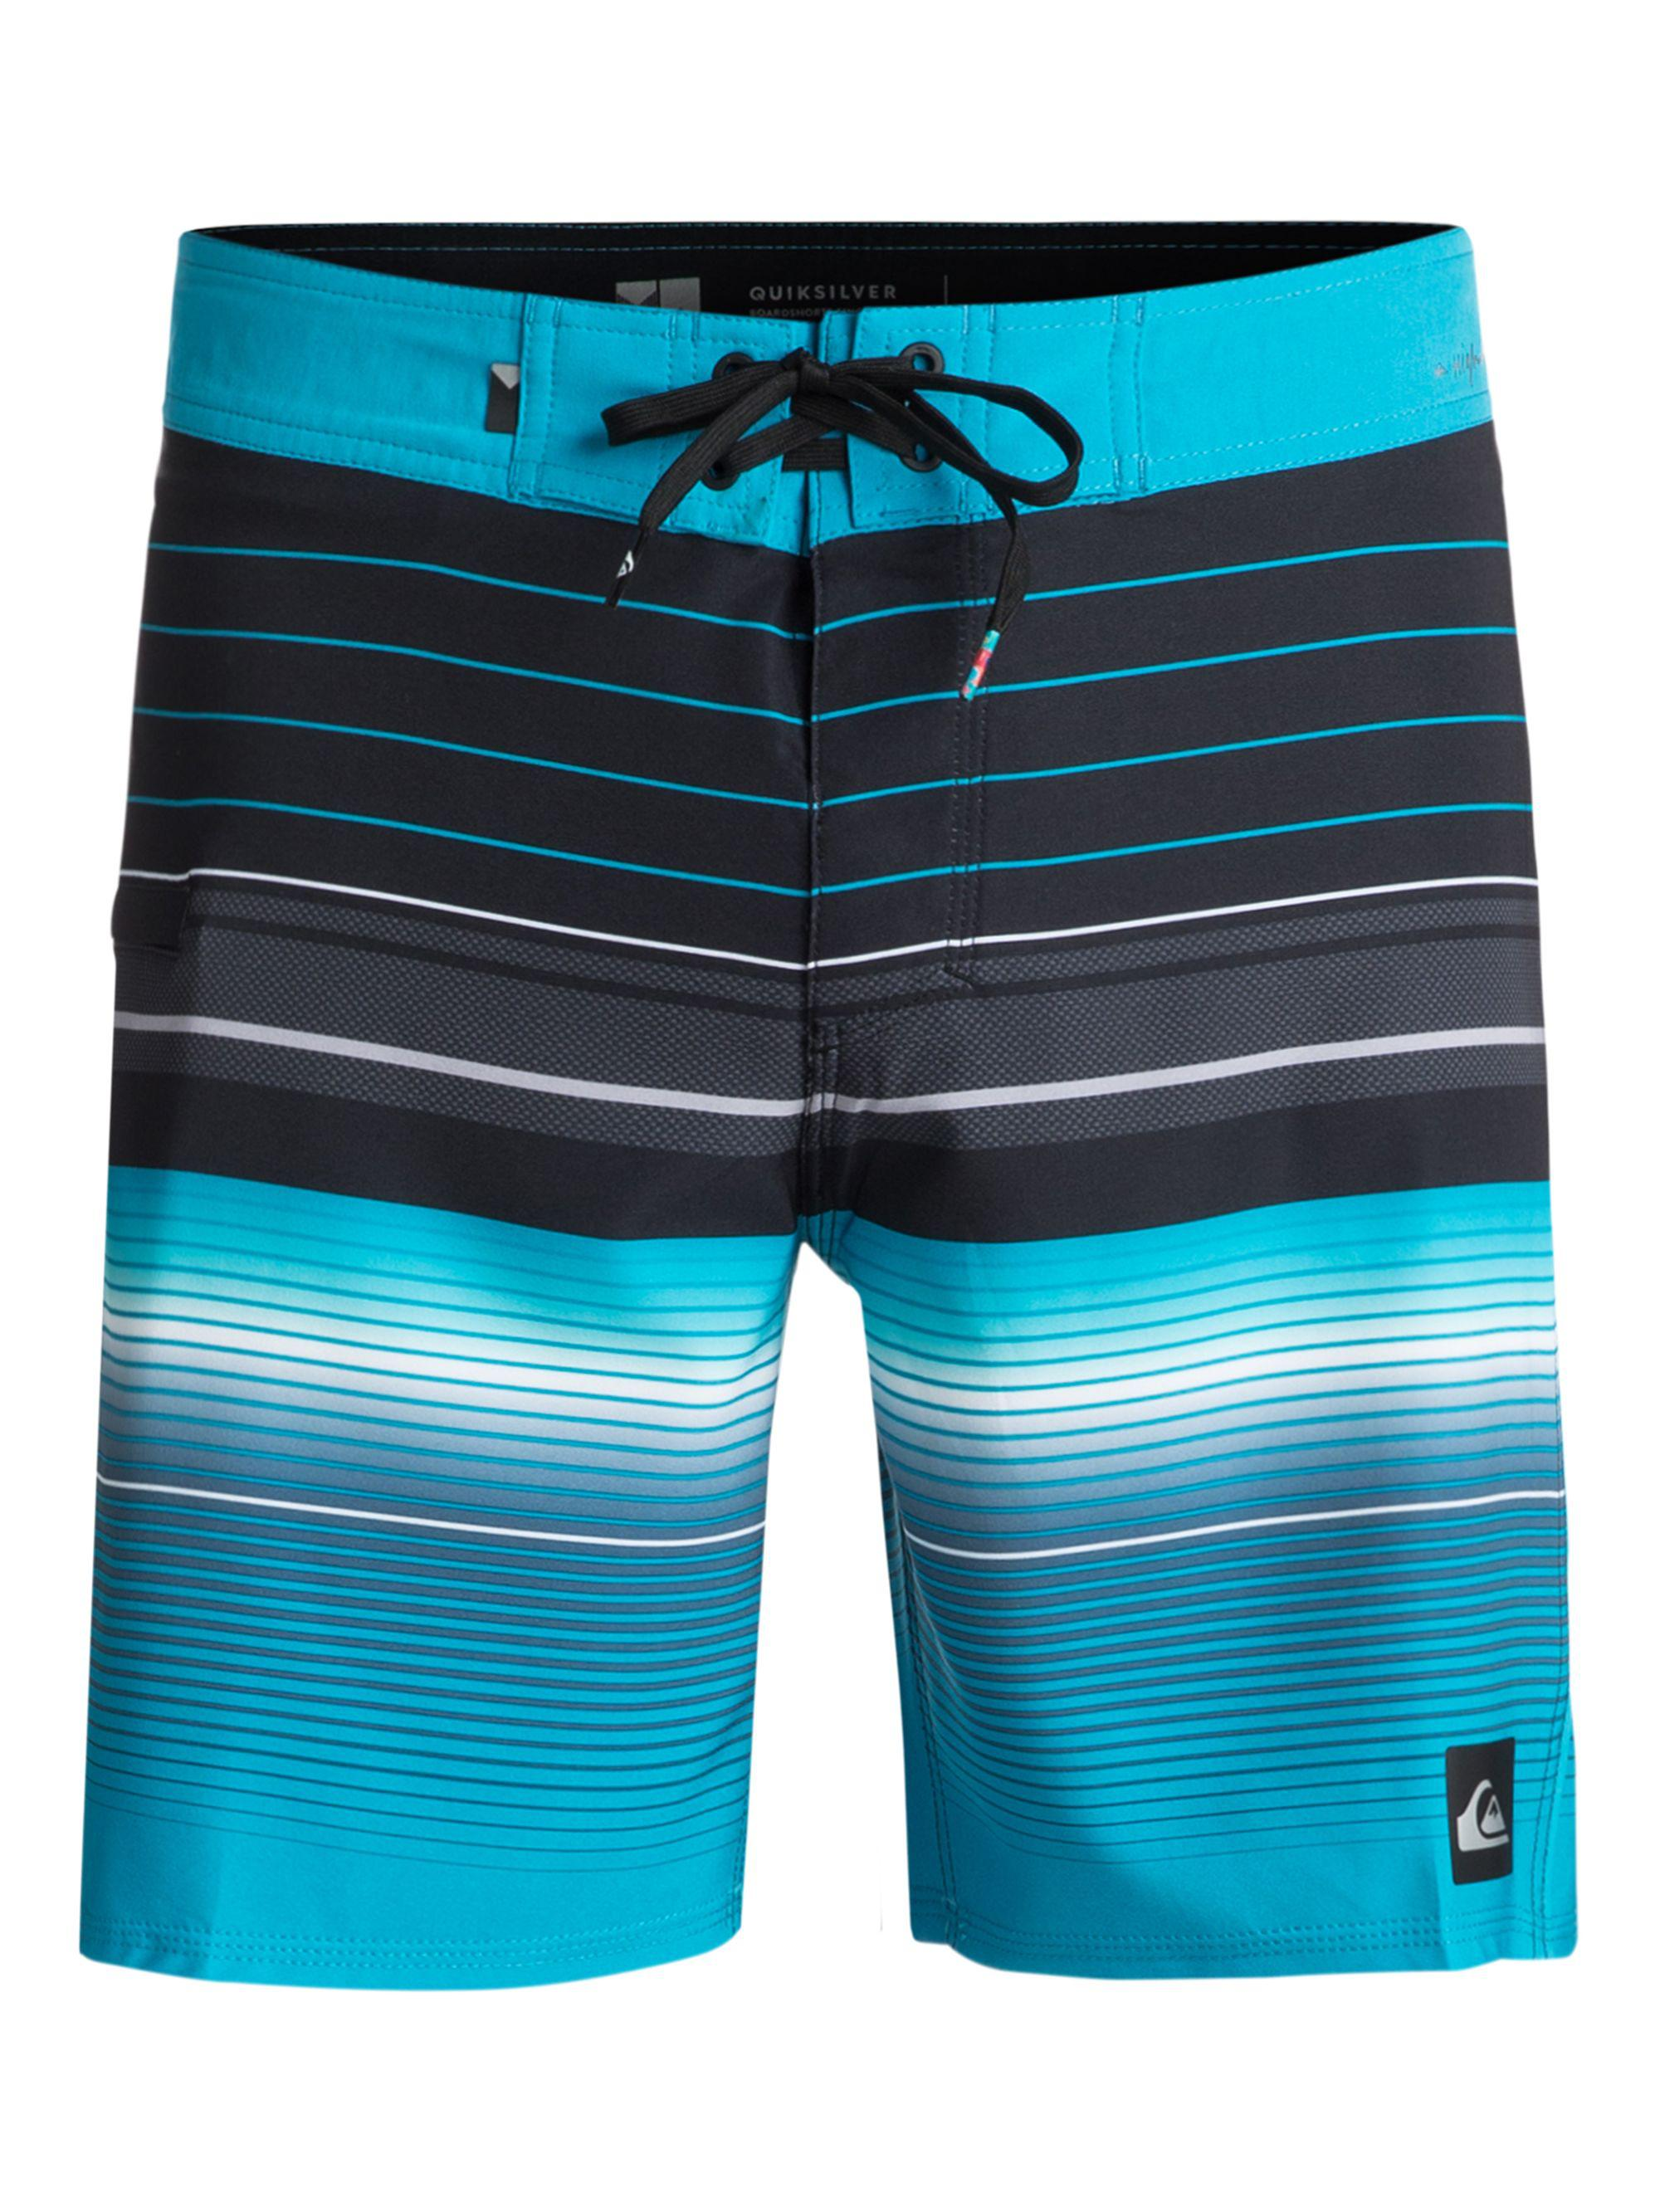 Quiksilver Men s Highlinesion 17 Board Shorts in Black for Men - Lyst 235463408c